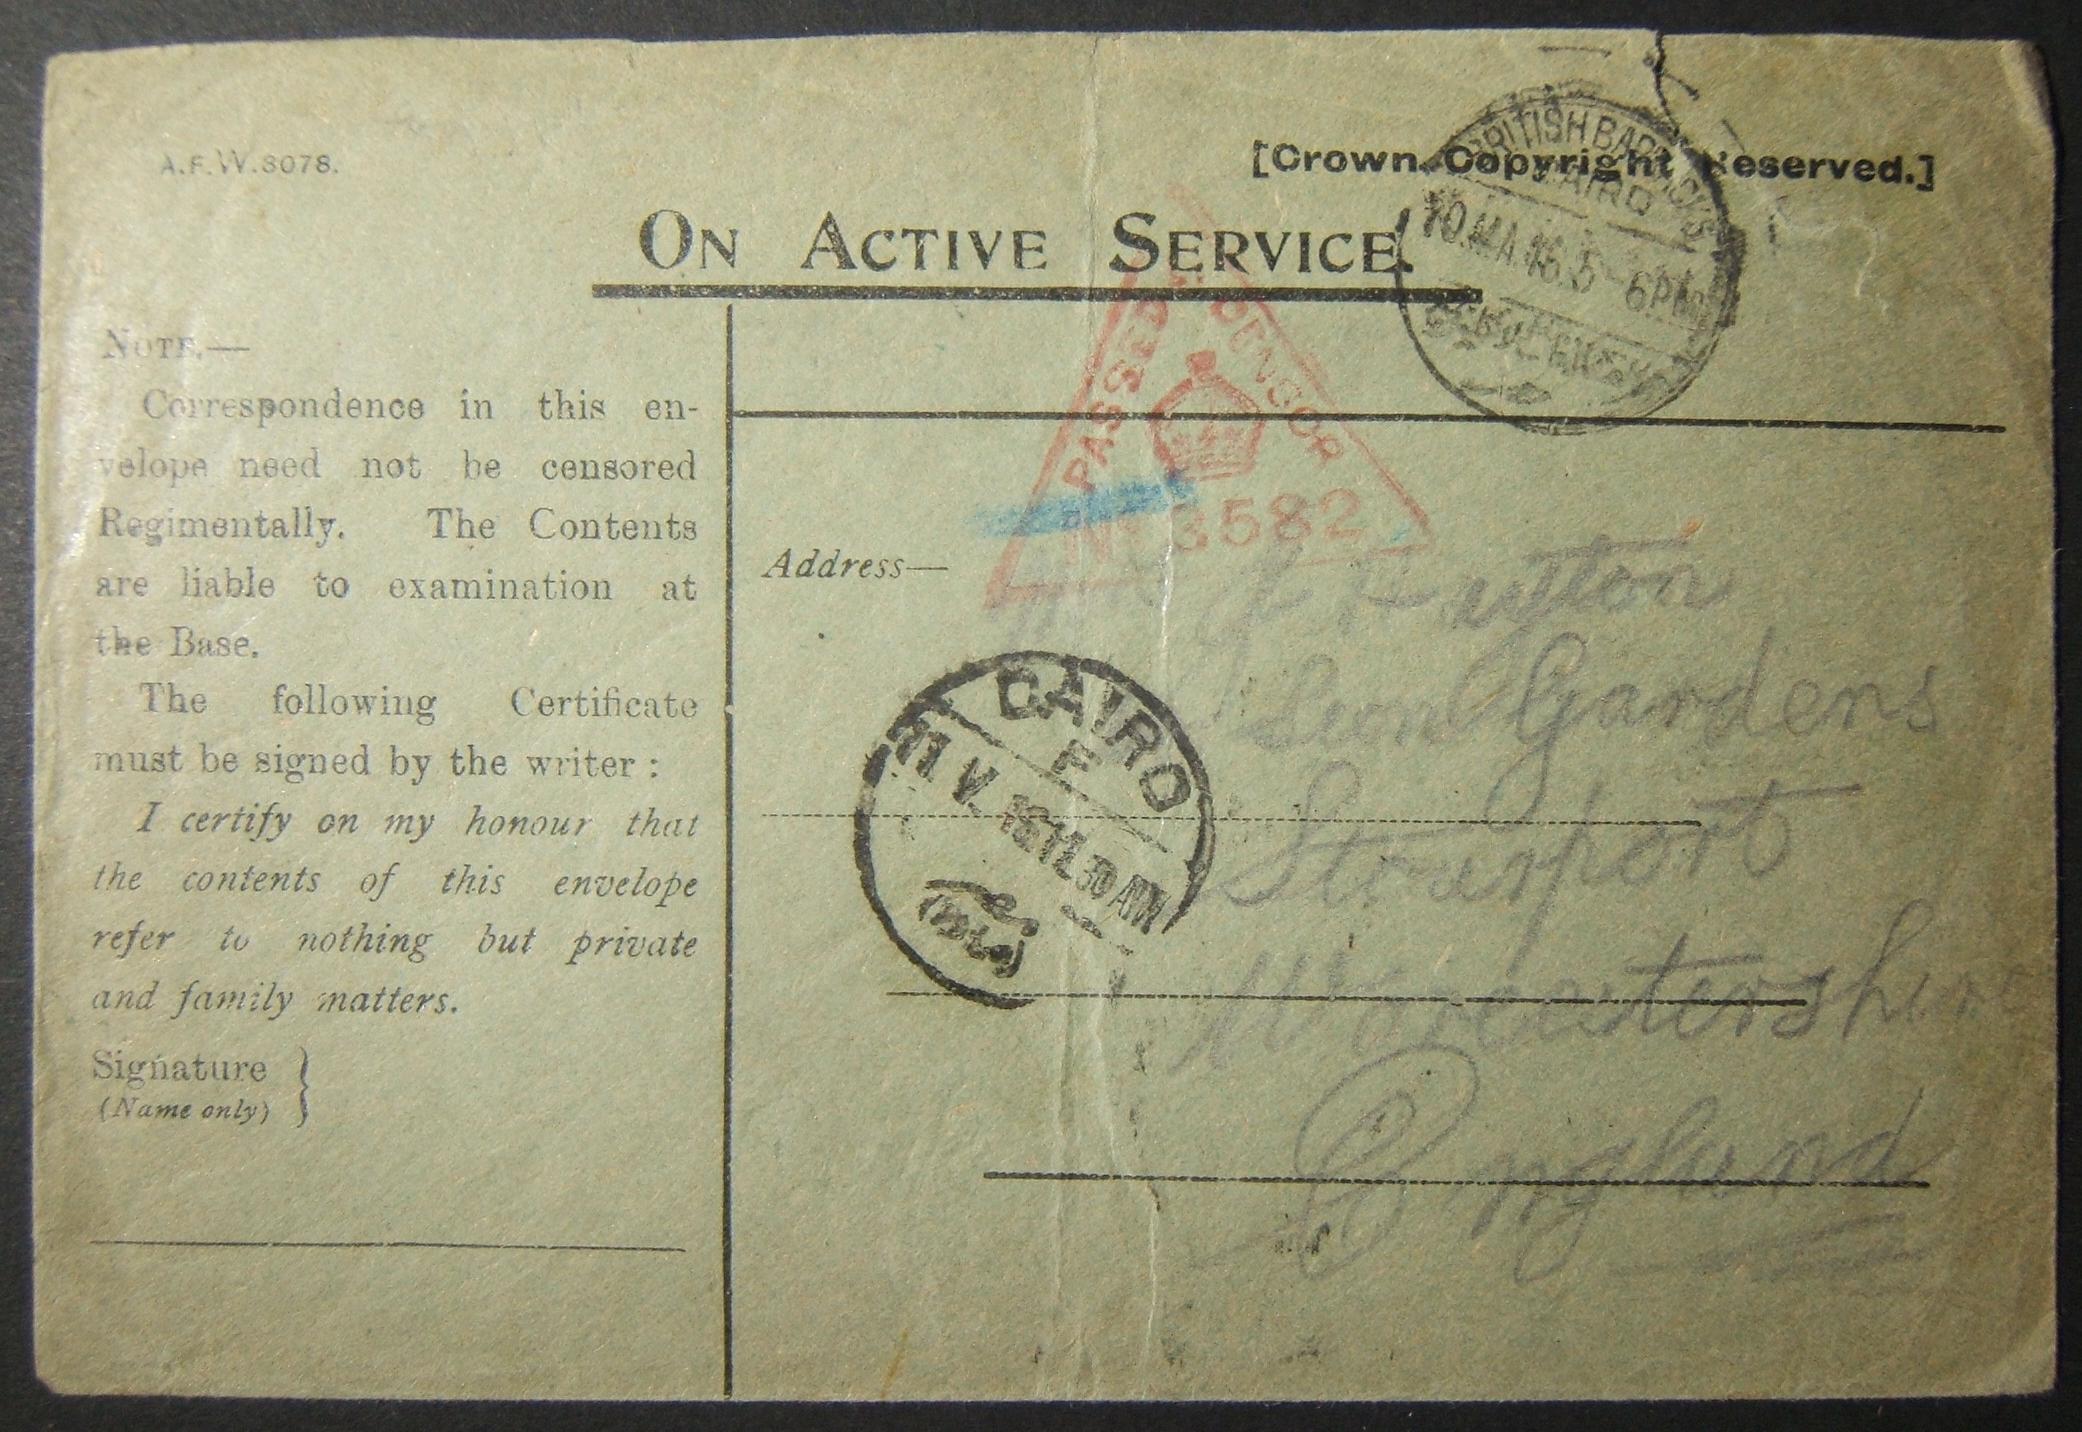 5/1916 WWI הצבא הבריטי חתום & undranked דואר בבריטניה דרך הדואר המצרי